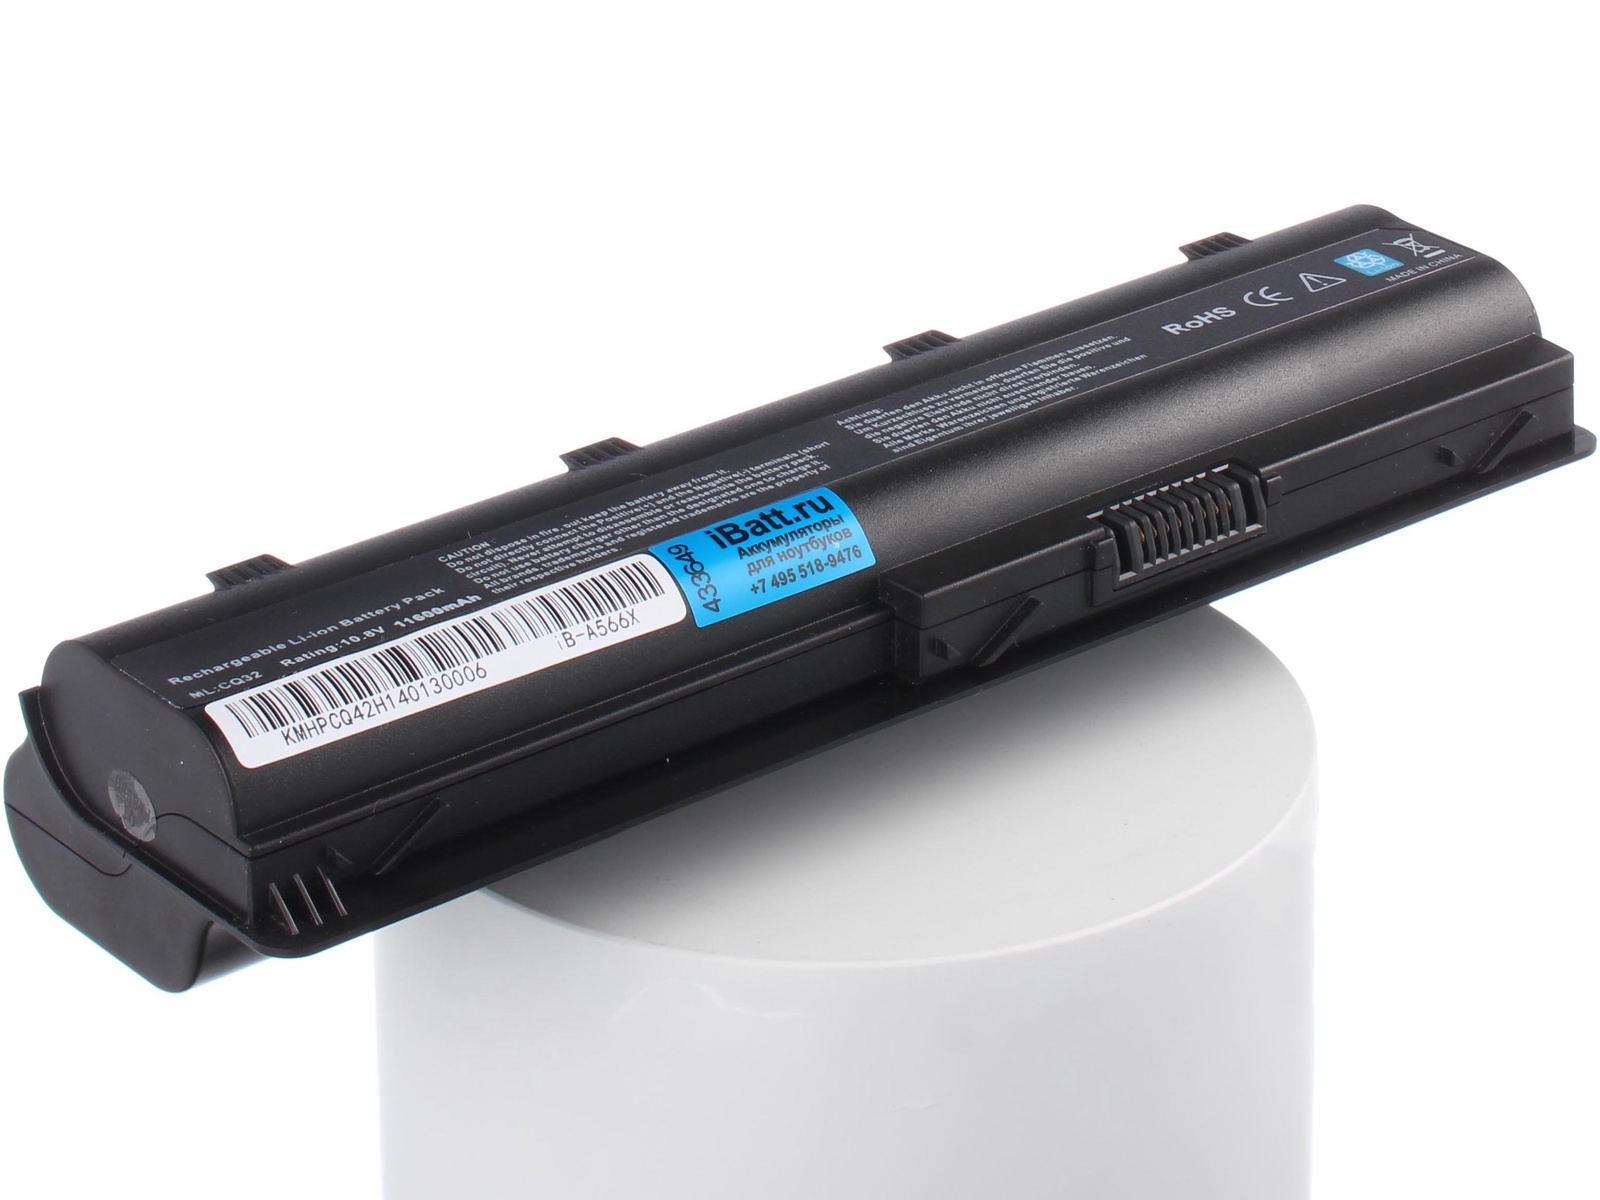 цена на Аккумулятор для ноутбука iBatt для HP-Compaq Pavilion dv6-6002er, Pavilion g7-1301er, Pavilion dv7-5000er, Pavilion dv7-6c54er, Pavilion g6-2320er, Pavilion g6-2359er, Pavilion g7-1251er, Pavilion g7-2052er, 2000-2d63SR